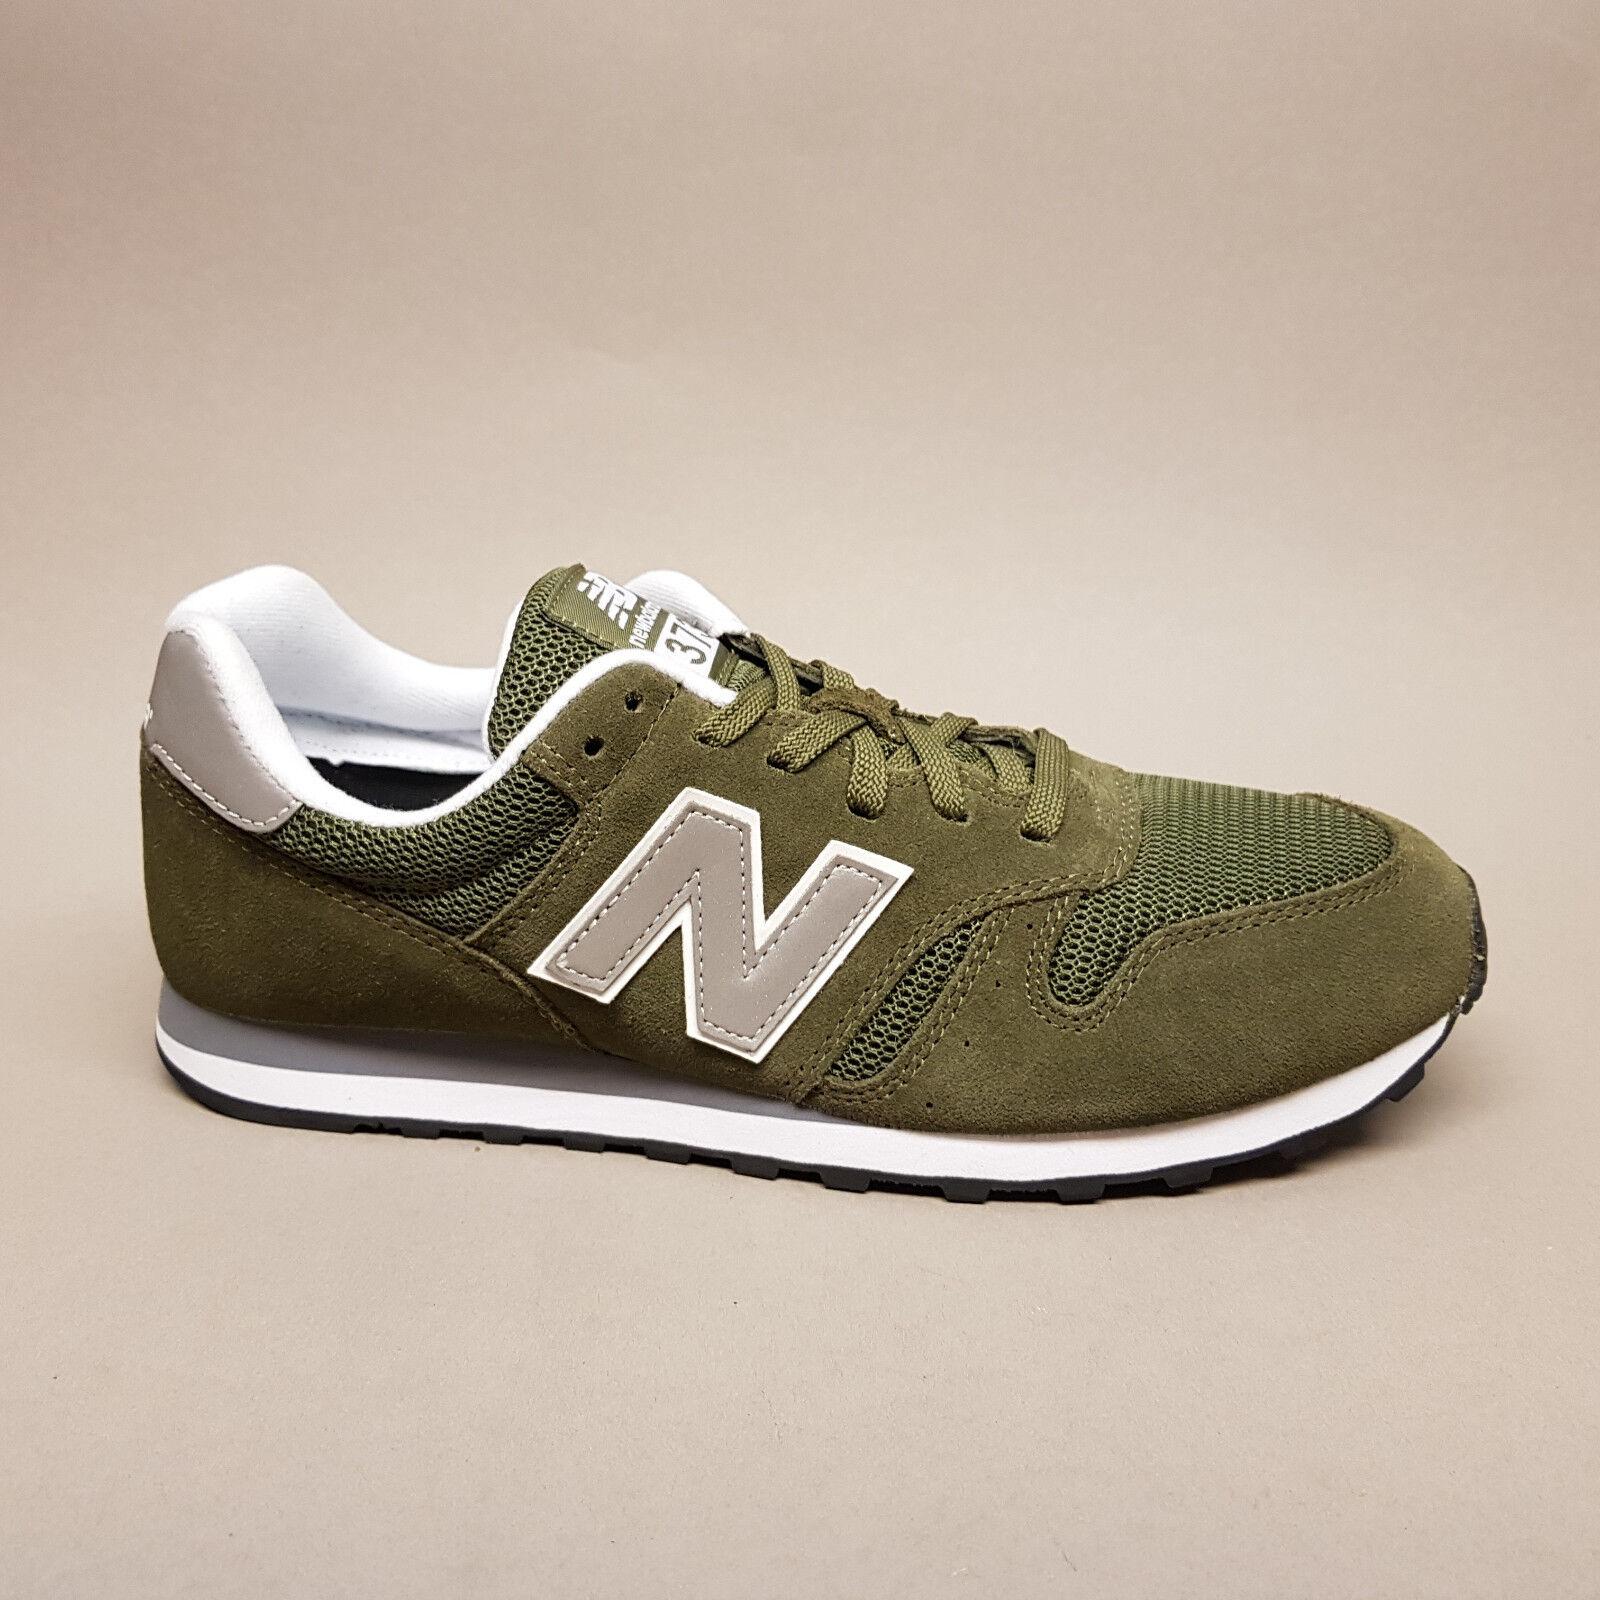 New Balance Classics Traditionnels ML373OLV Olive Turnschuhe Sneakers grün